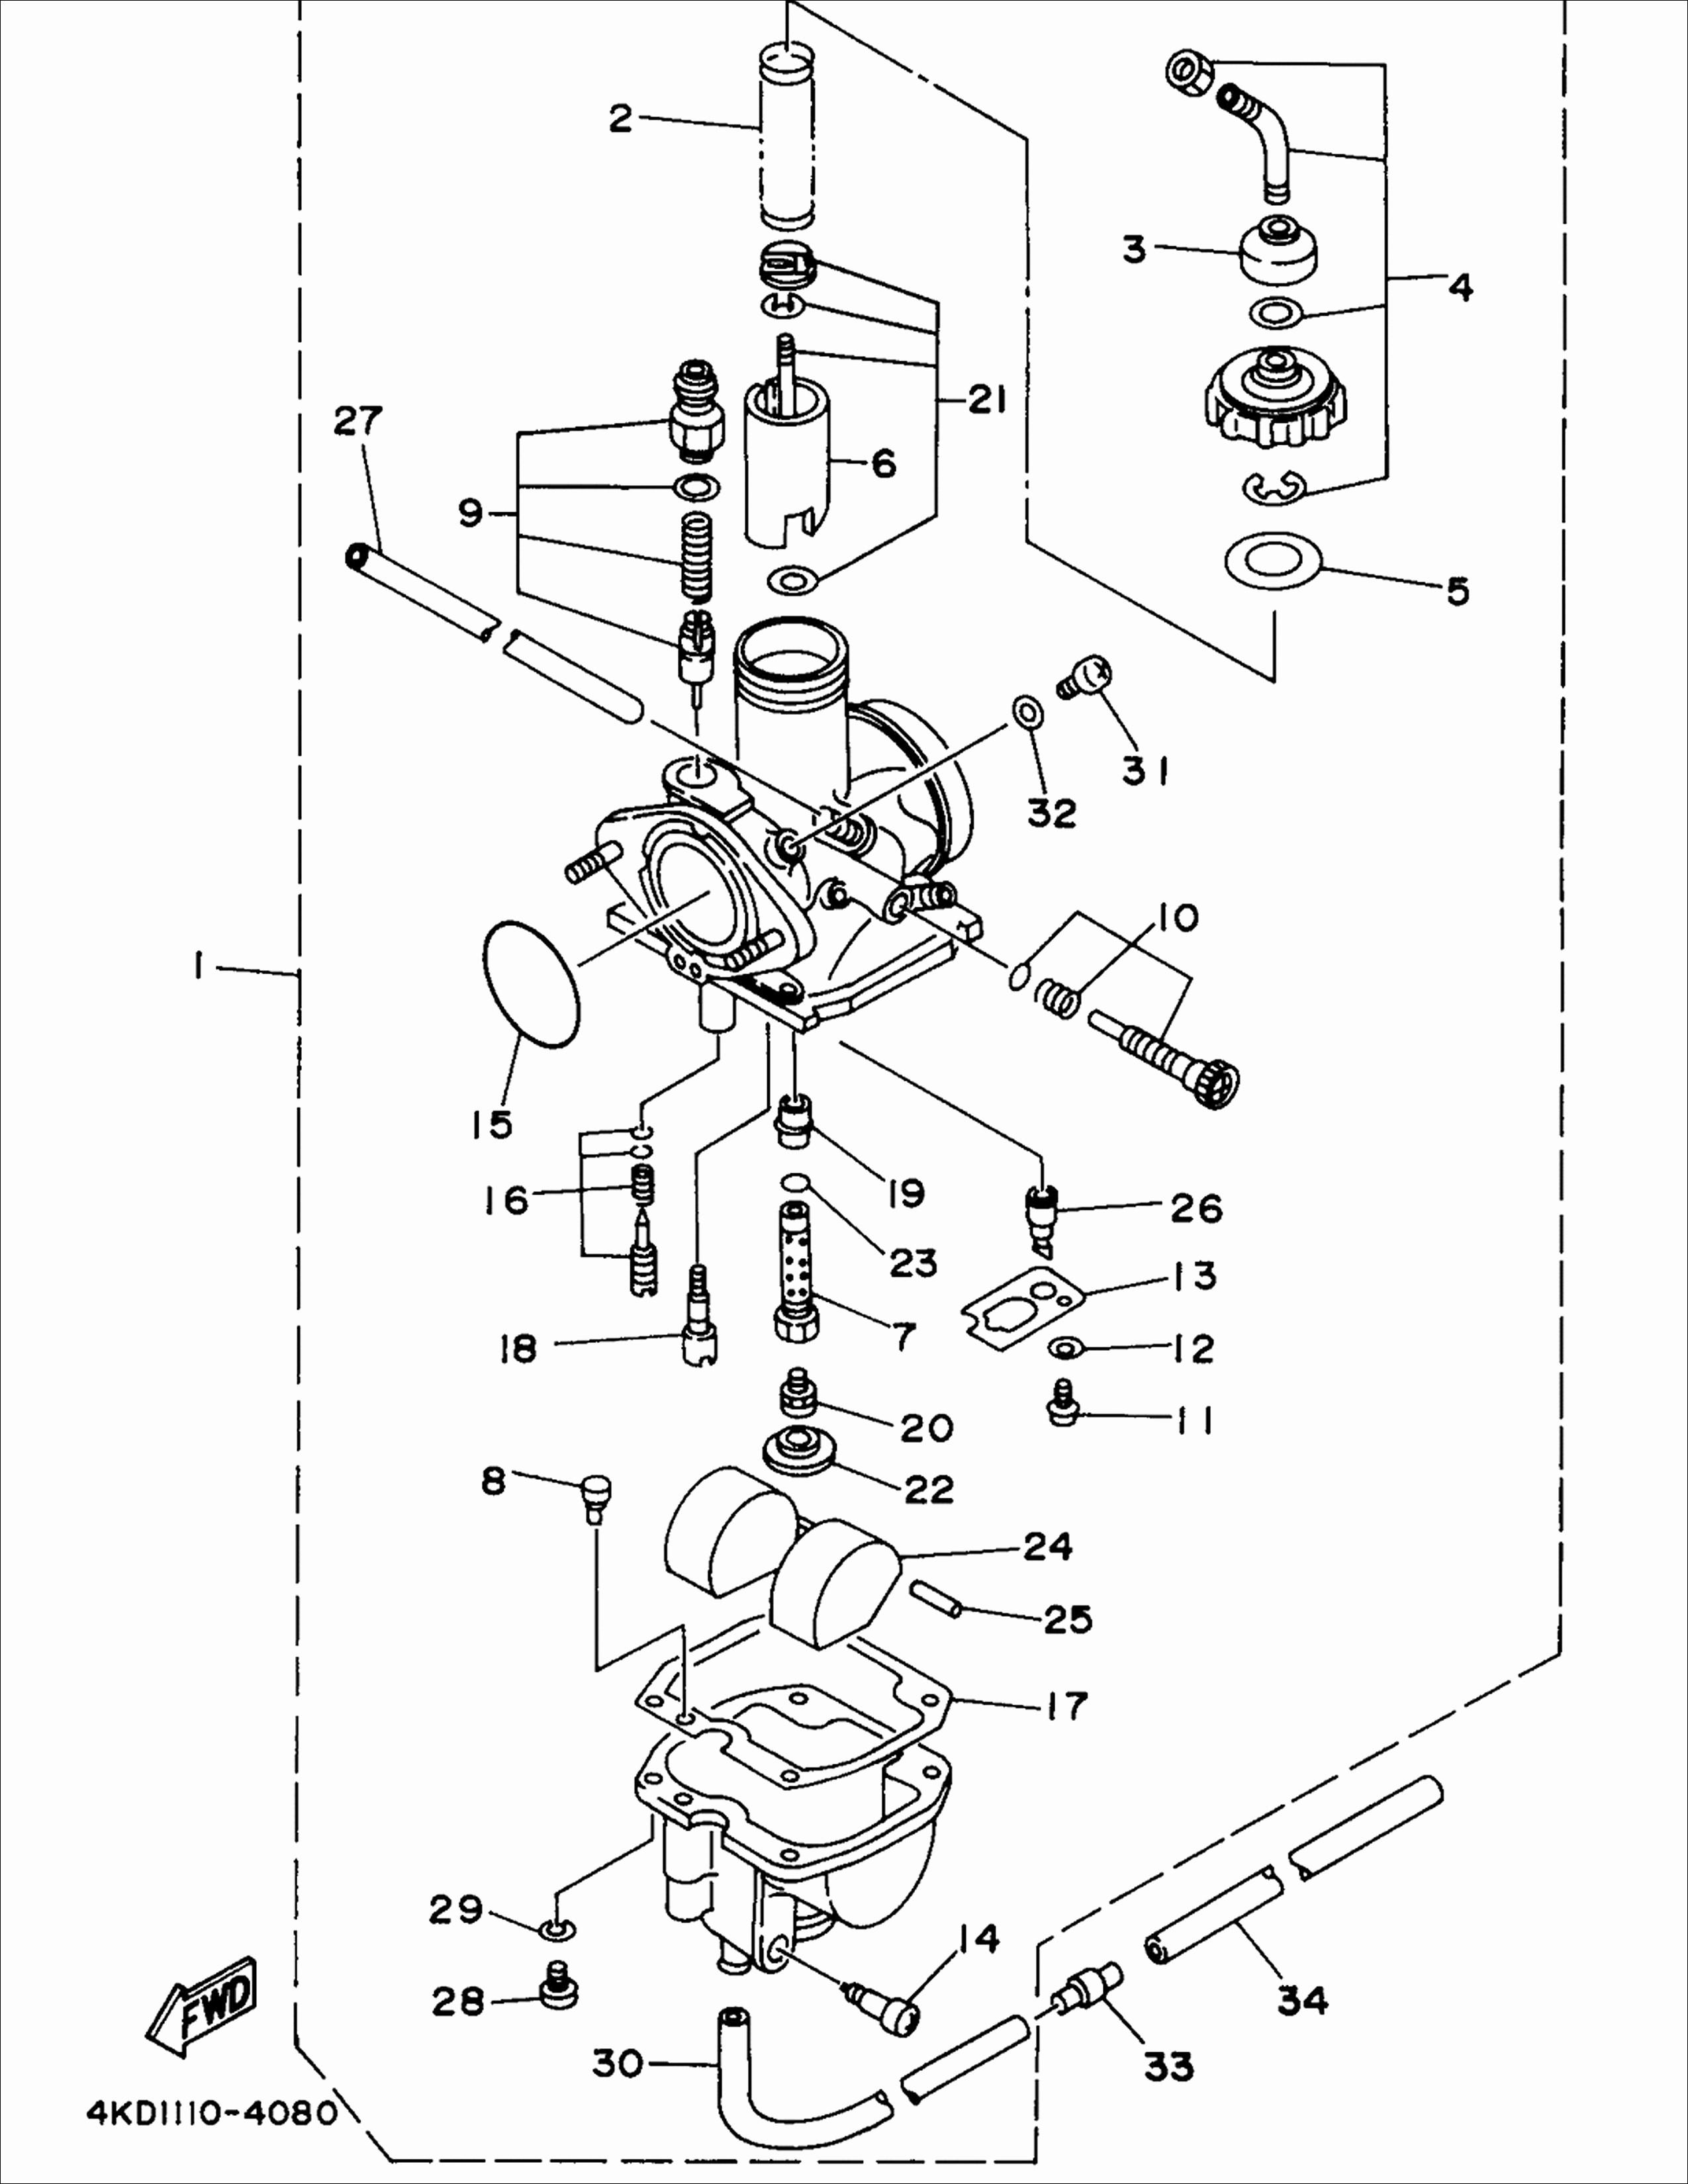 Gm 3800 Engine Diagram Vector Diagram Engine Vector Wiring Diagrams Instructions Of Gm 3800 Engine Diagram